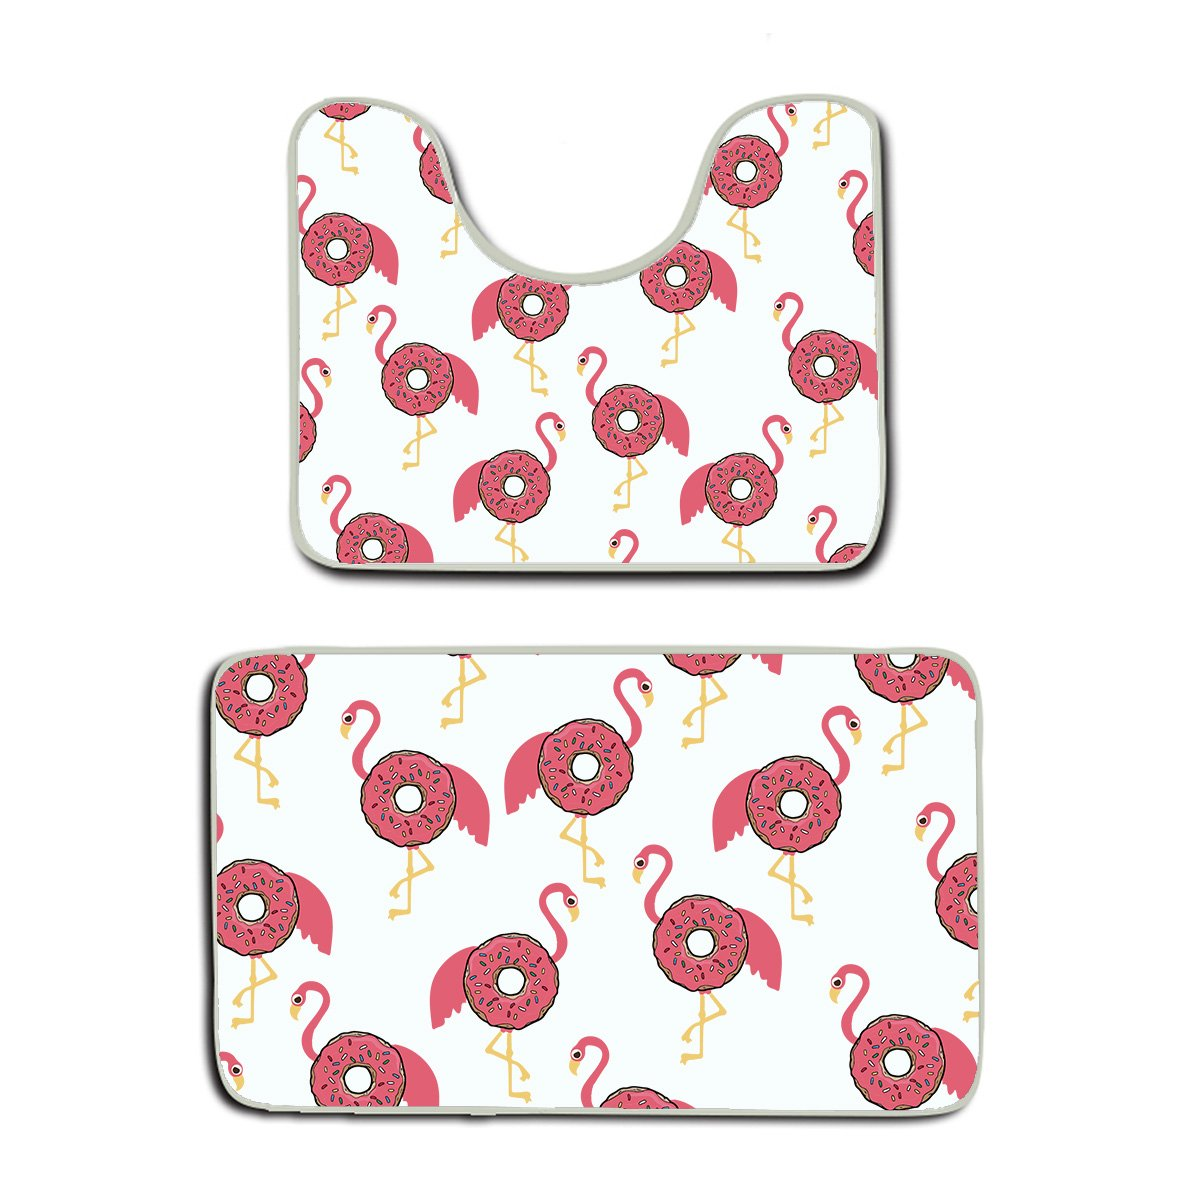 US TANG 2 Piece Bath Mat Set - Flamingo Donut Funny - Luxury White Cotton Bath Mats Hotel Spa Washable tub Set